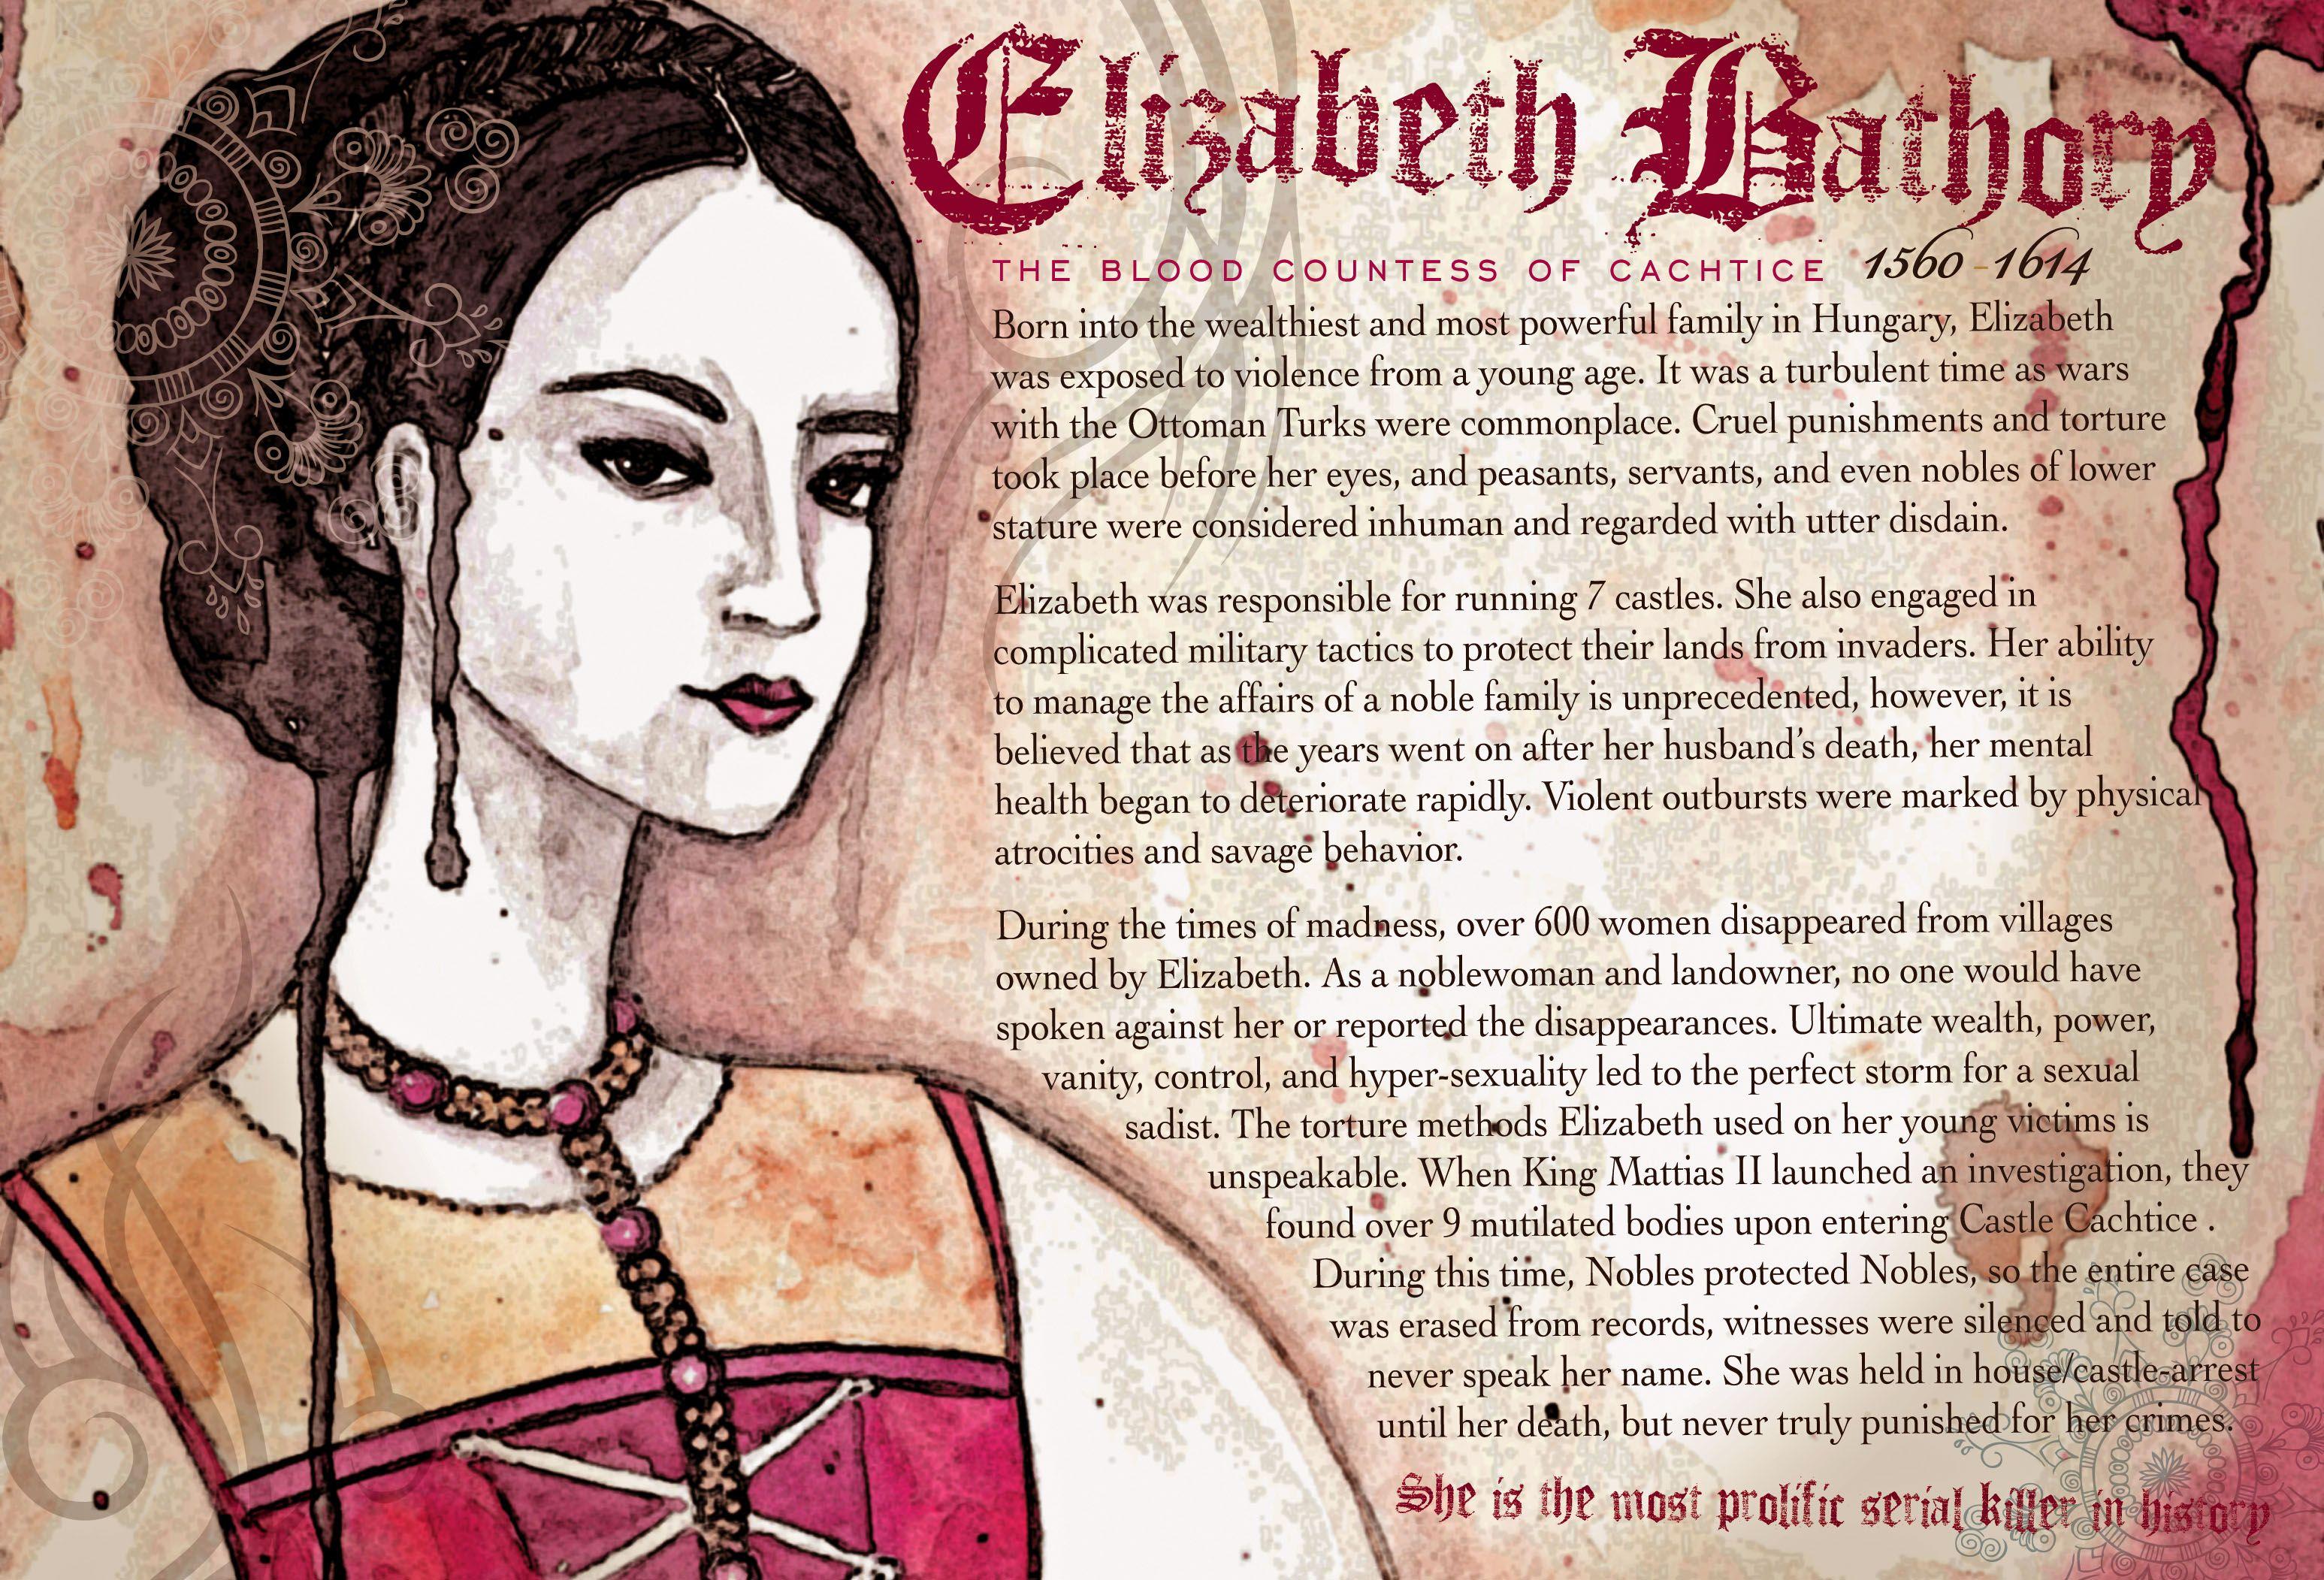 the historic case of bloody elizabeth bathory The bloody countess // elizabeth  historical figure aesthetic:  but ferid has the same surname as elizabeth bathory, an infamous female serial killer .